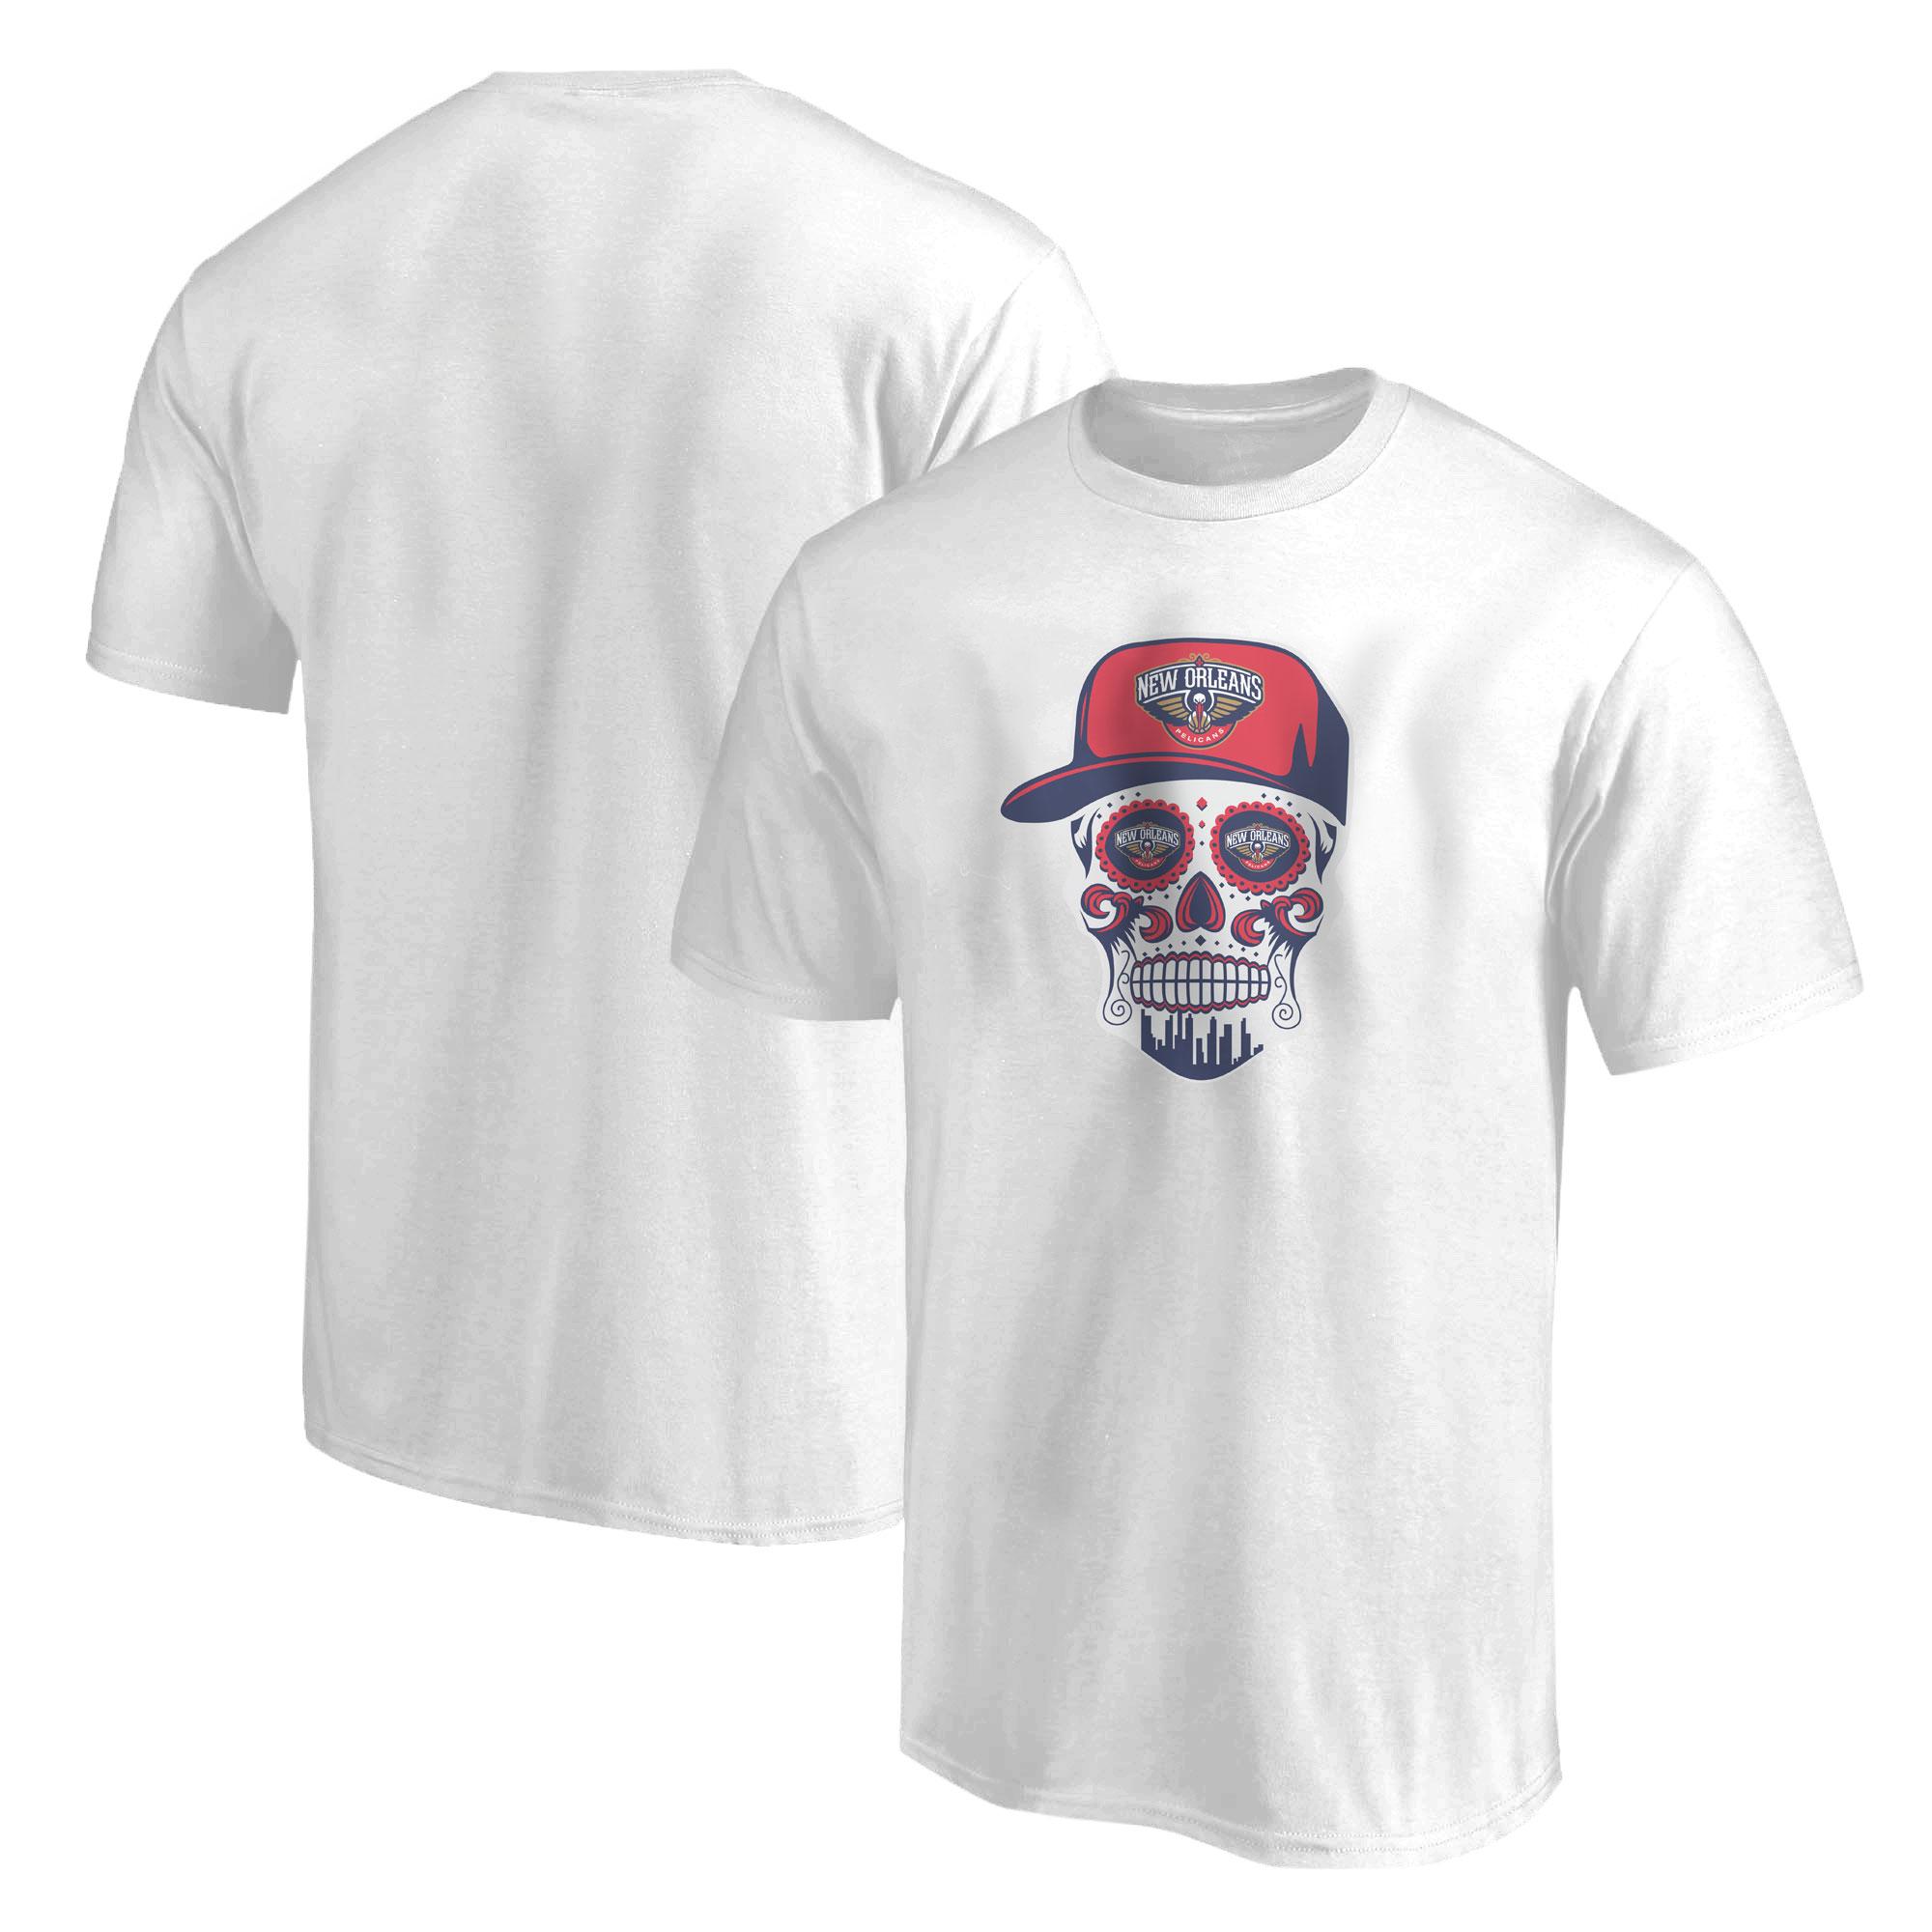 Pelicans Skull  Tshirt (TSH-WHT-NP-460-NBA-NOLA-SKULL)